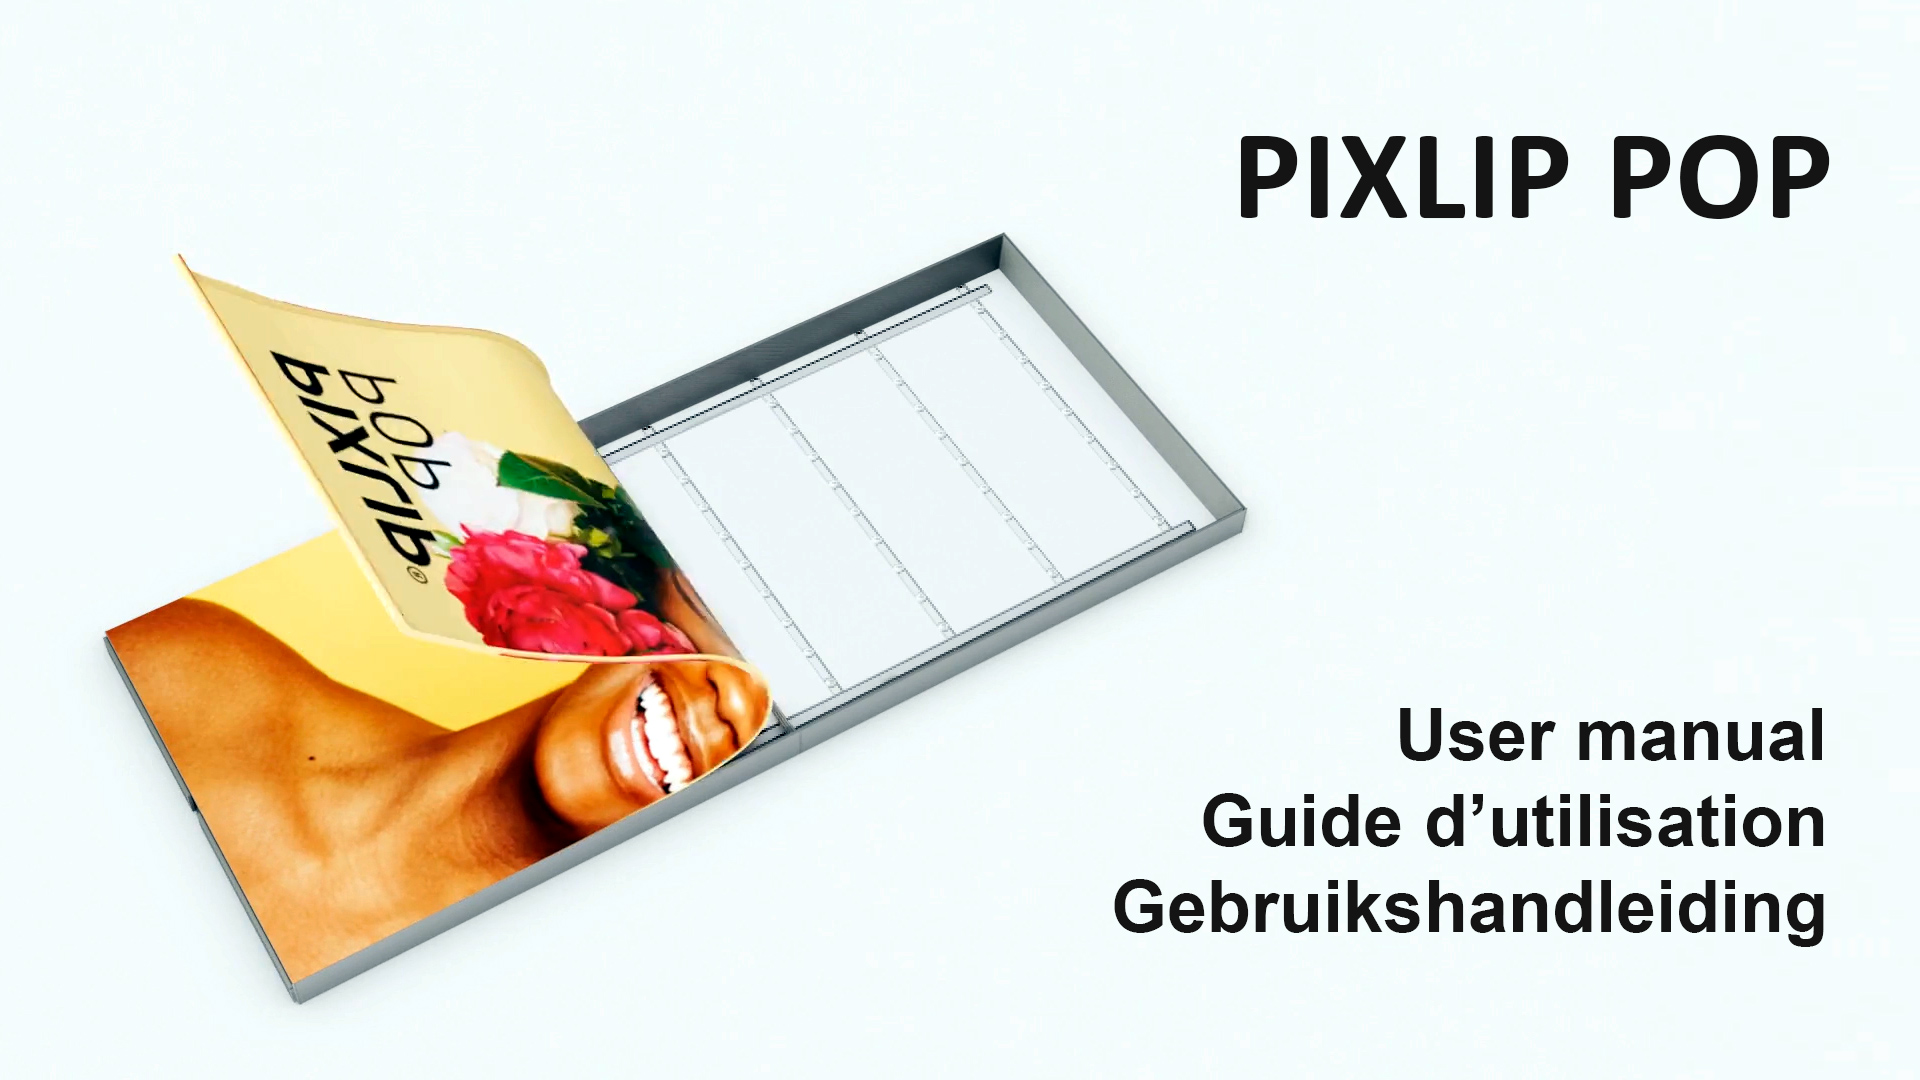 PIXLIP-POP-User-manual-Guide-d'utilisation-Gebruikshandleiding-Lightingbox-textile